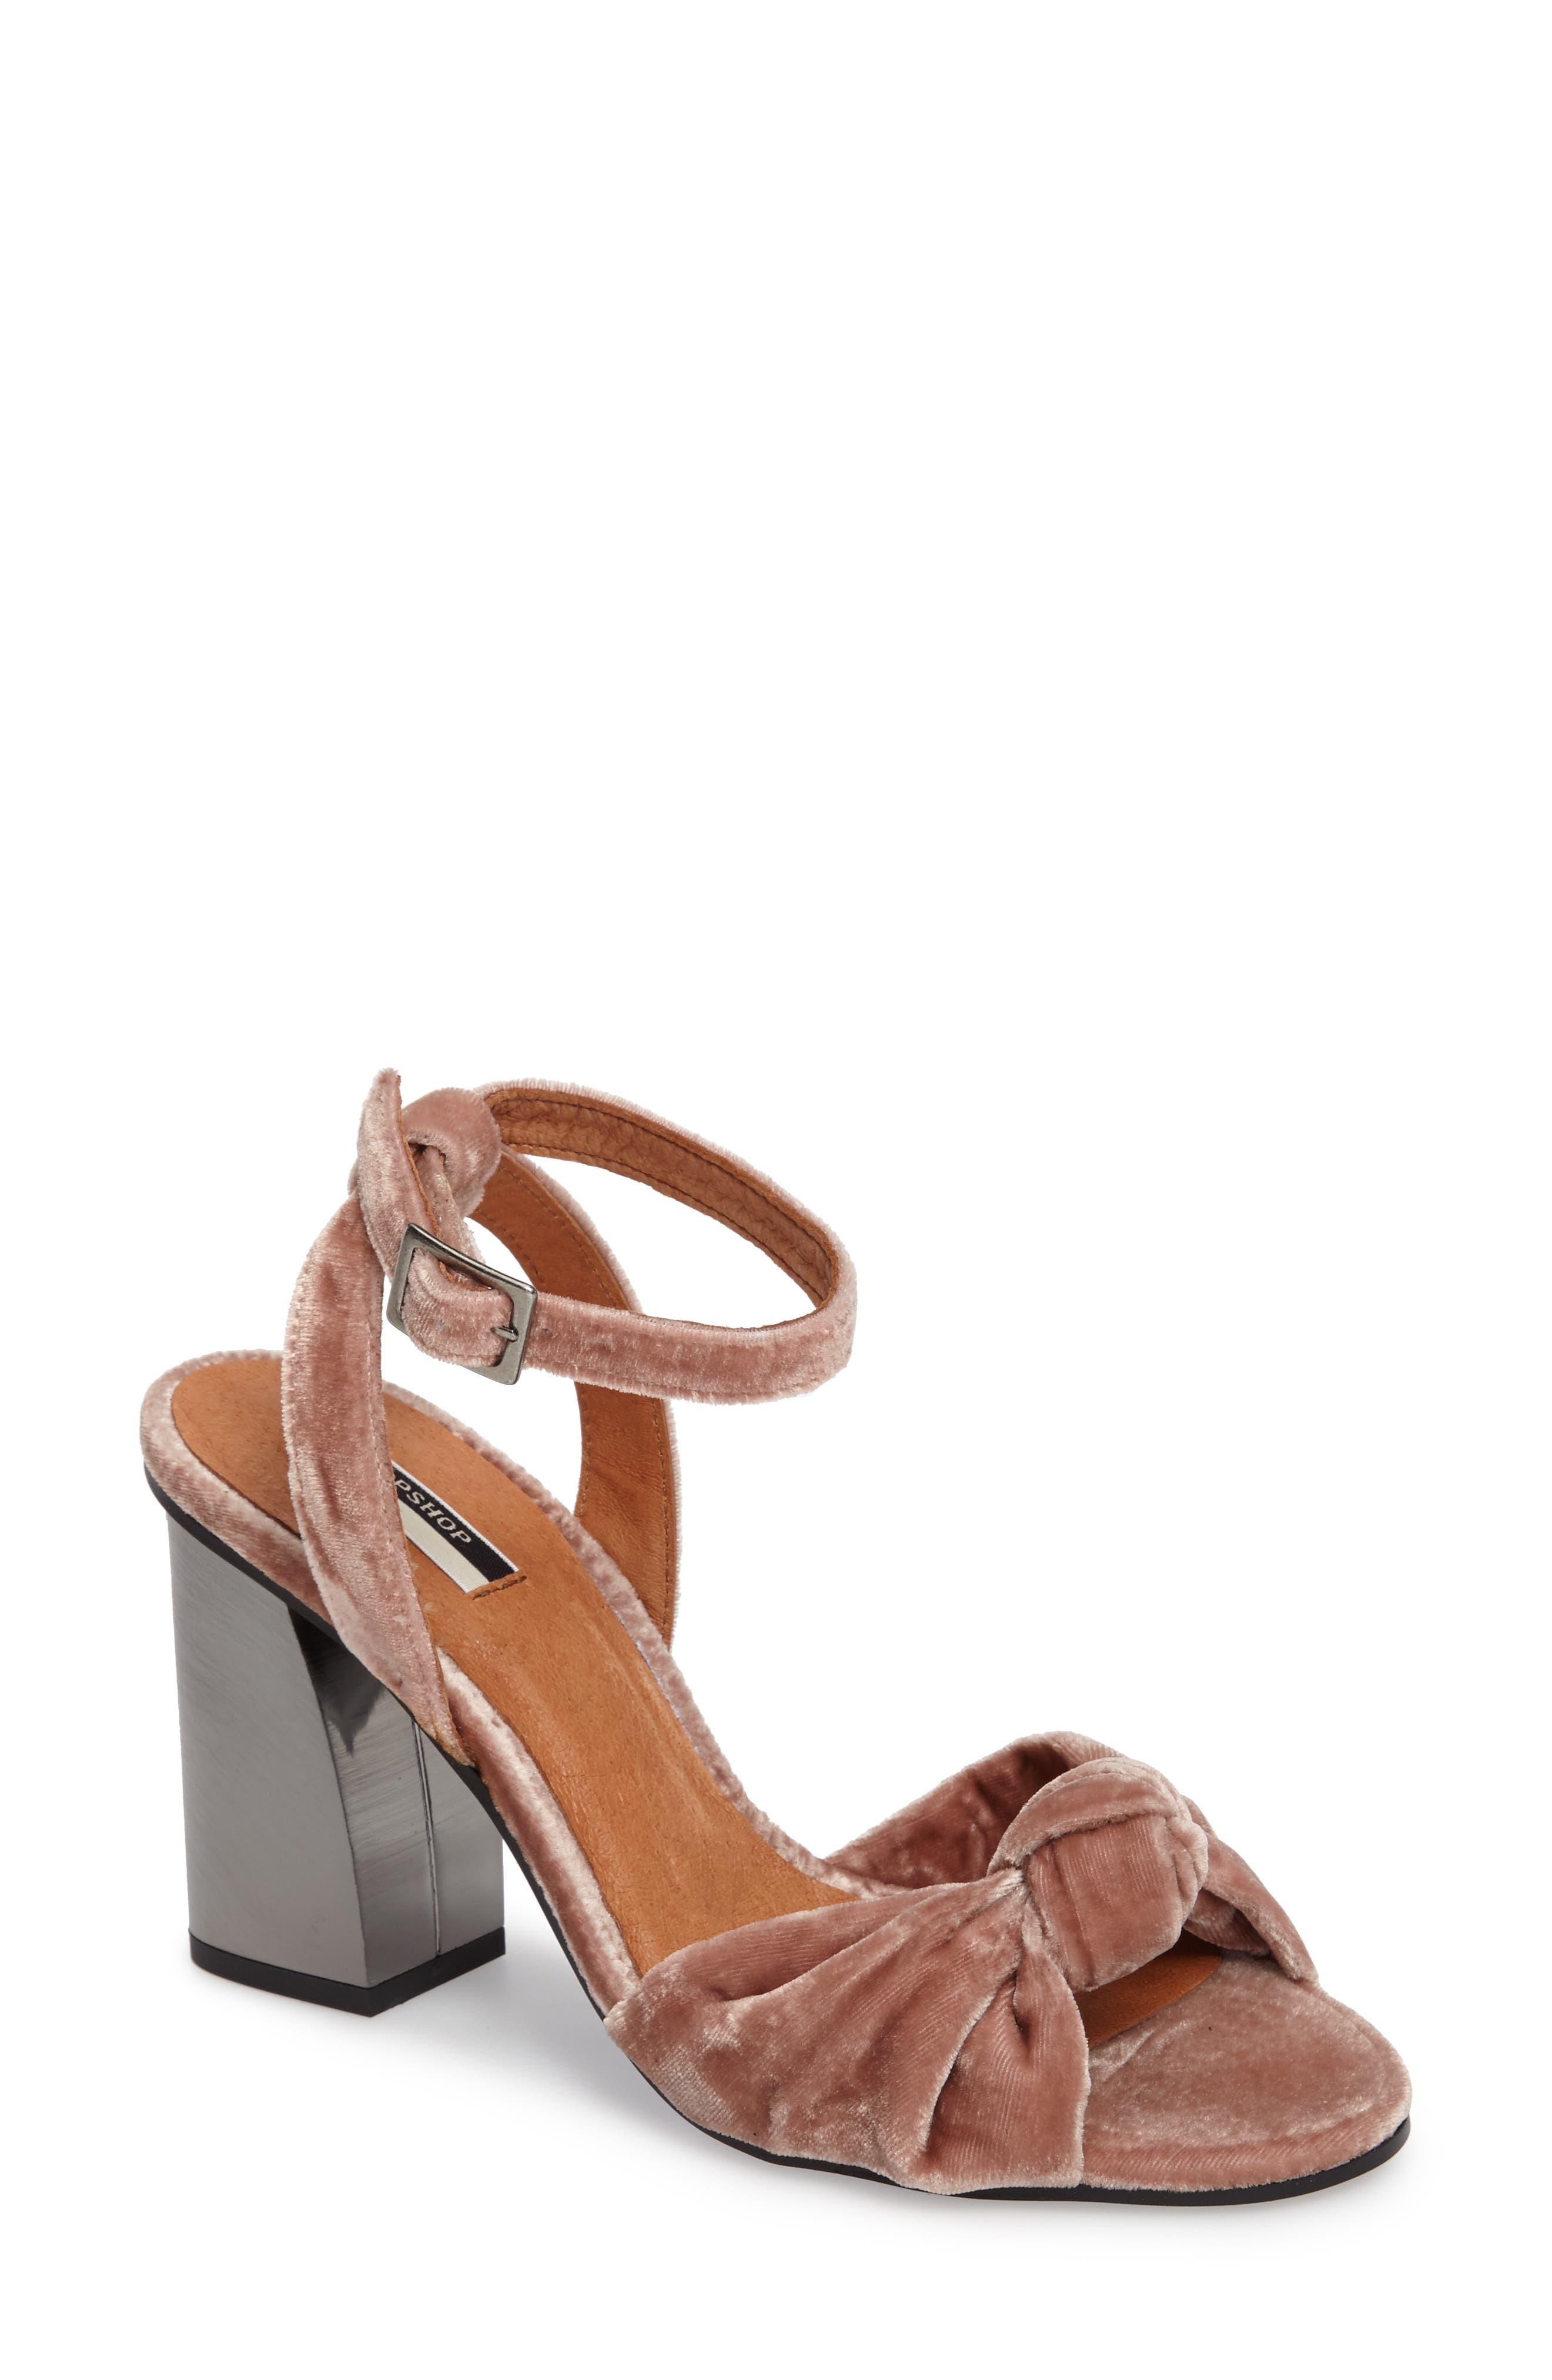 Main Image - Topshop Rocksy Ankle Strap Sandal (Women)